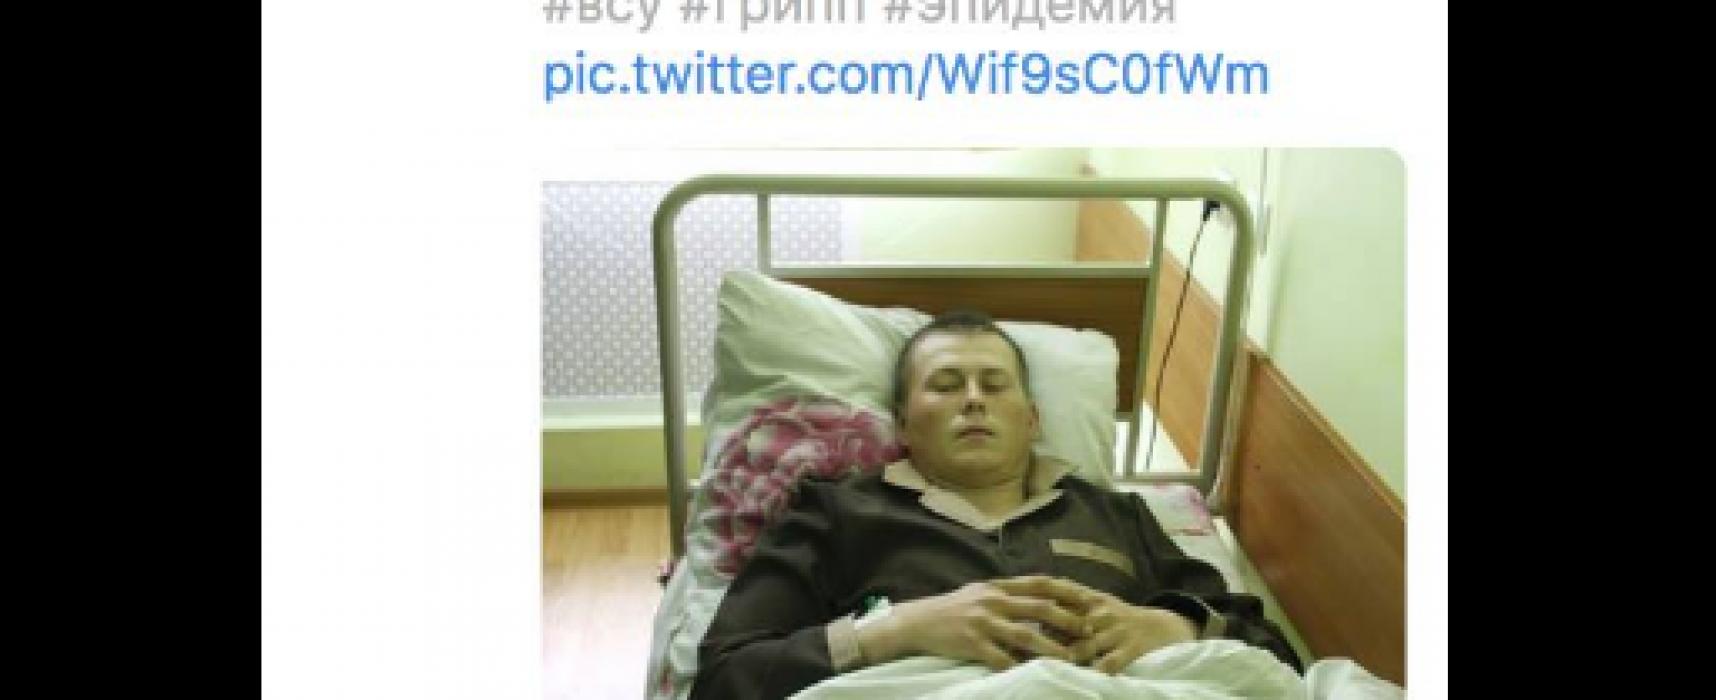 Канал «Звезда» выдал российского спецназовца за бойца ВСУ